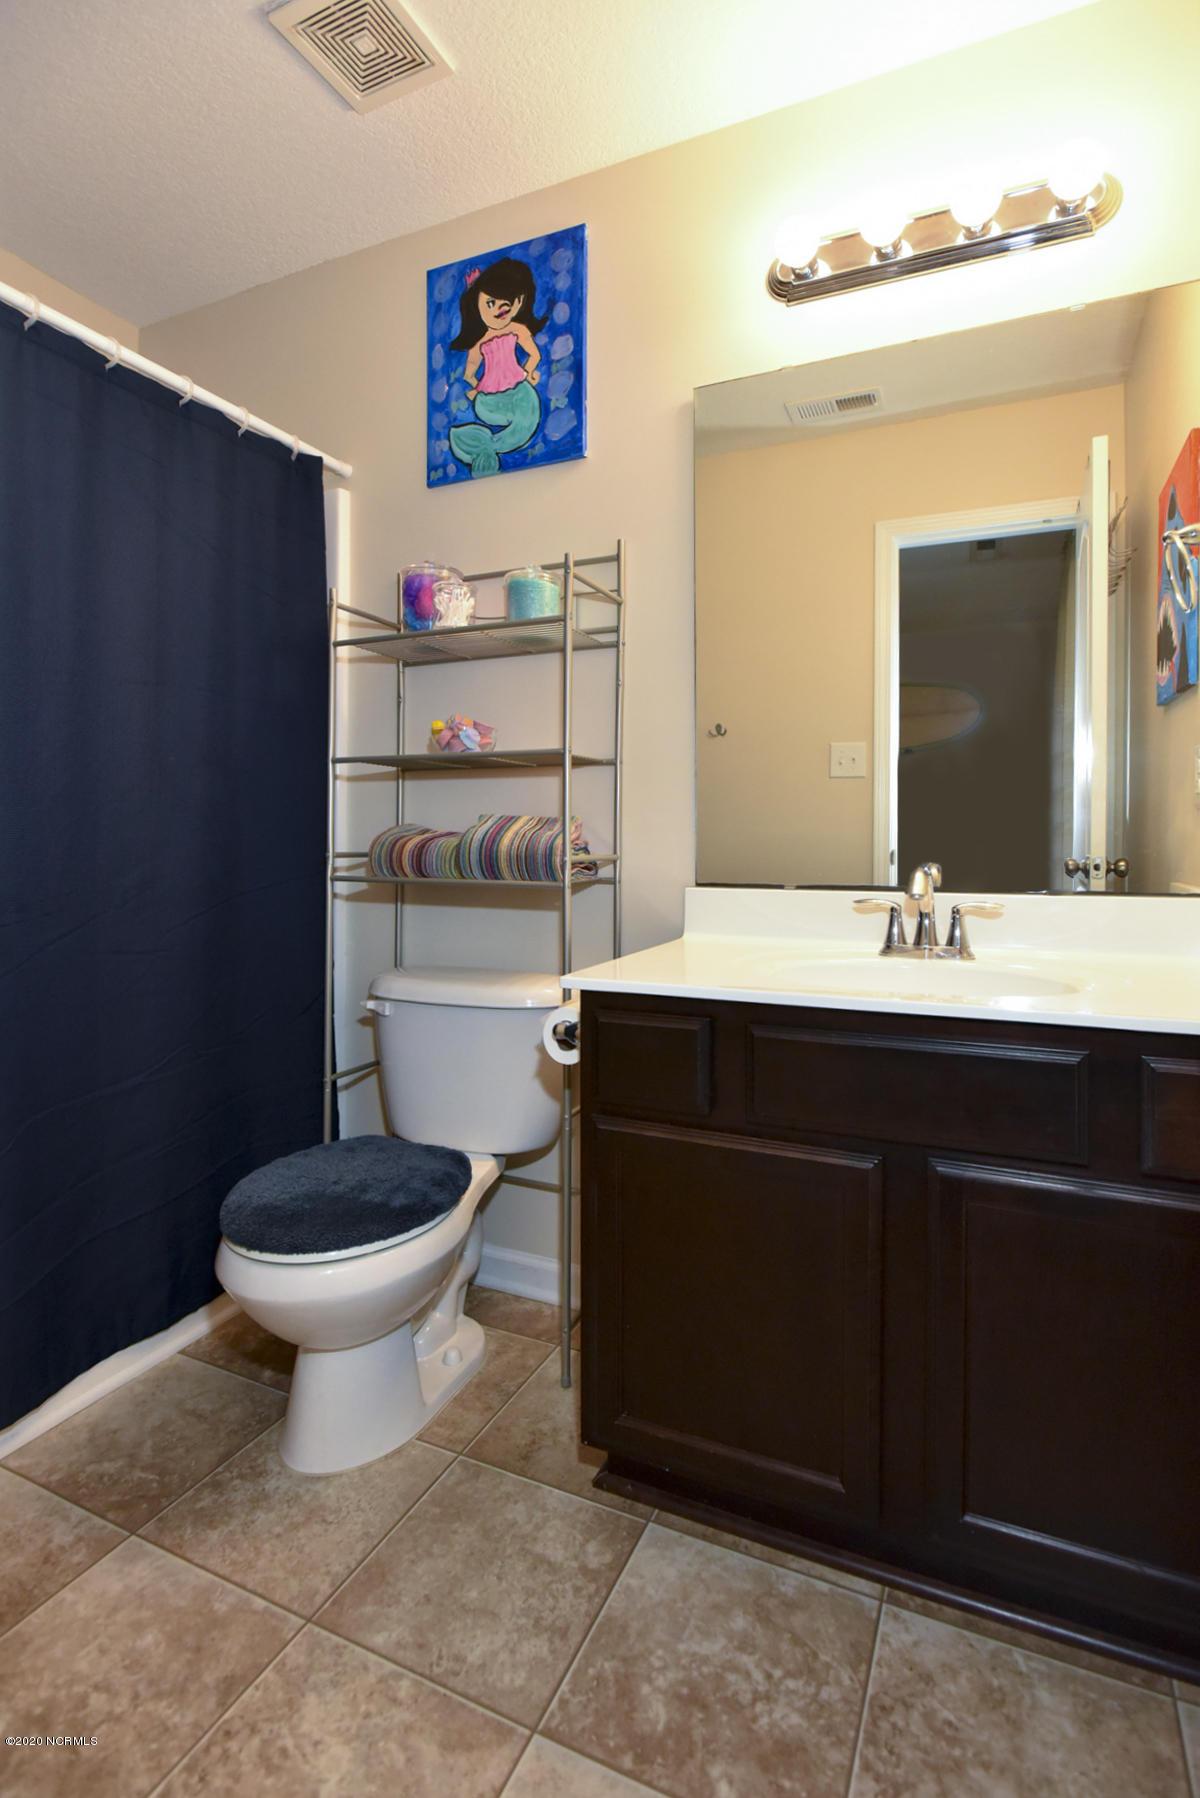 141 Glen Cannon Drive, Jacksonville, North Carolina 28546, 2 Bedrooms Bedrooms, ,2 BathroomsBathrooms,Residential,For Sale,Glen Cannon,100233785